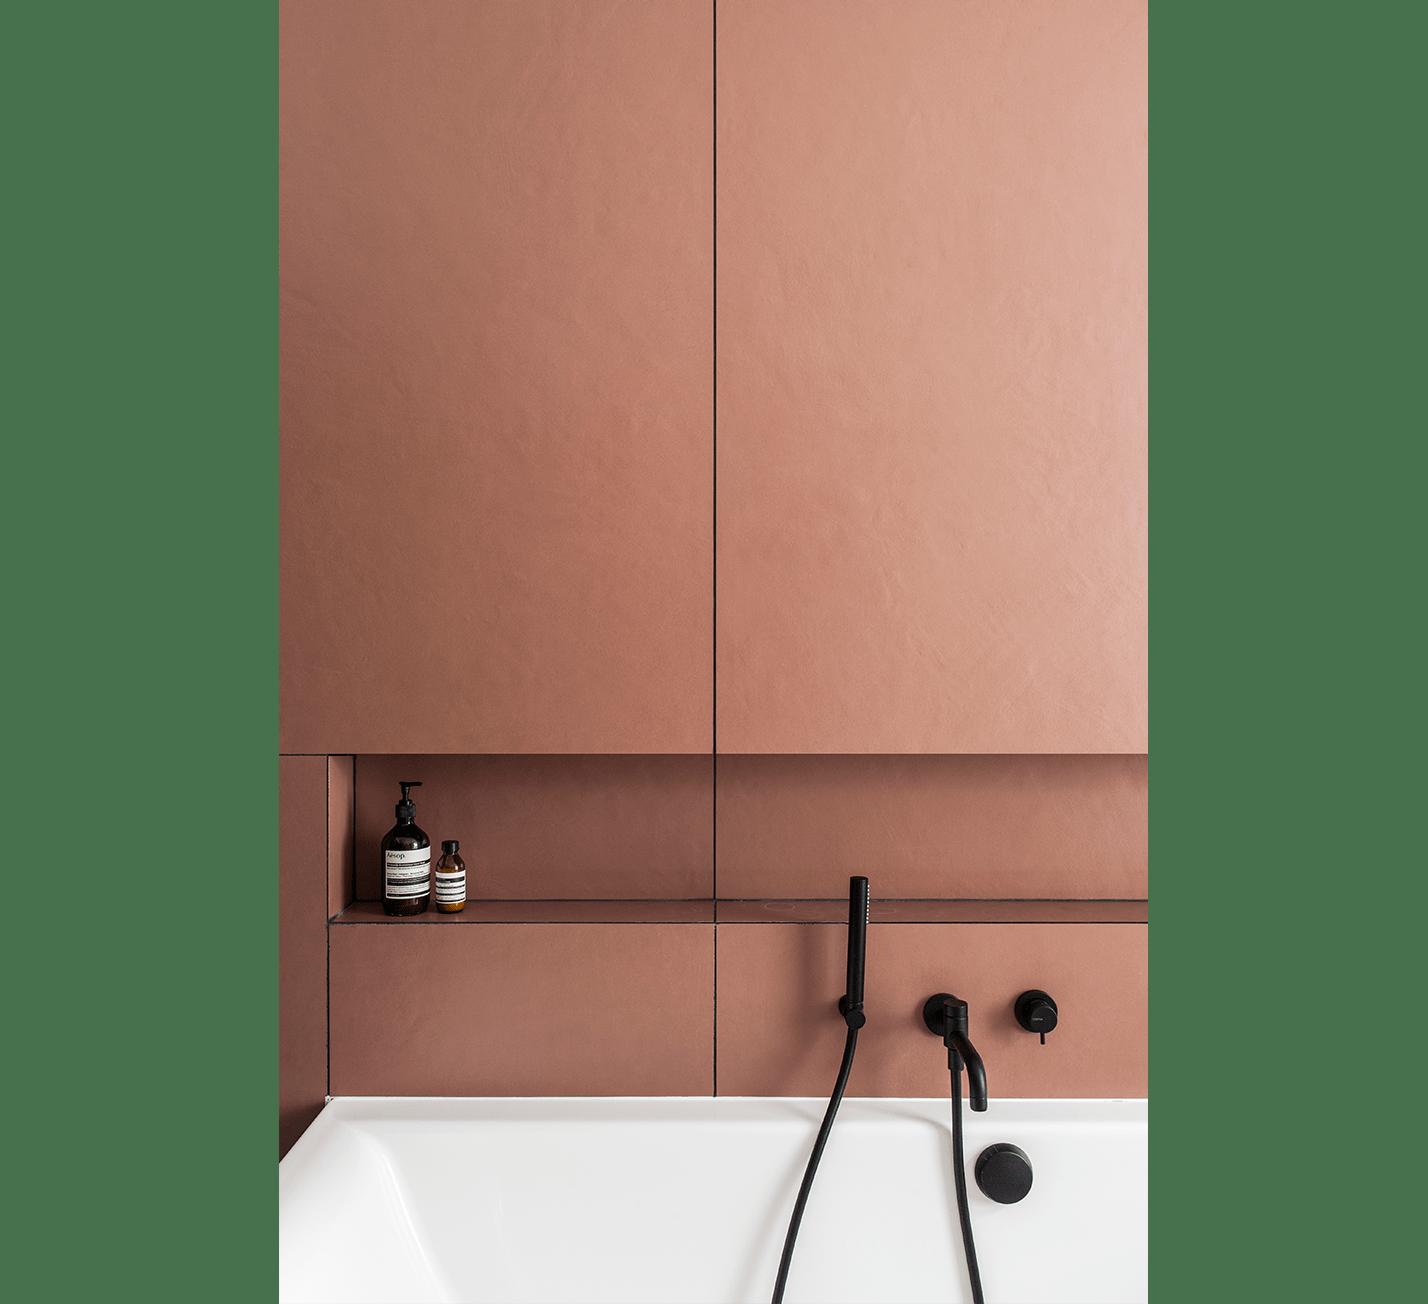 Projet-Arlequin-Atelier-Steve-Pauline-Borgia-Architecture-interieur-05-min